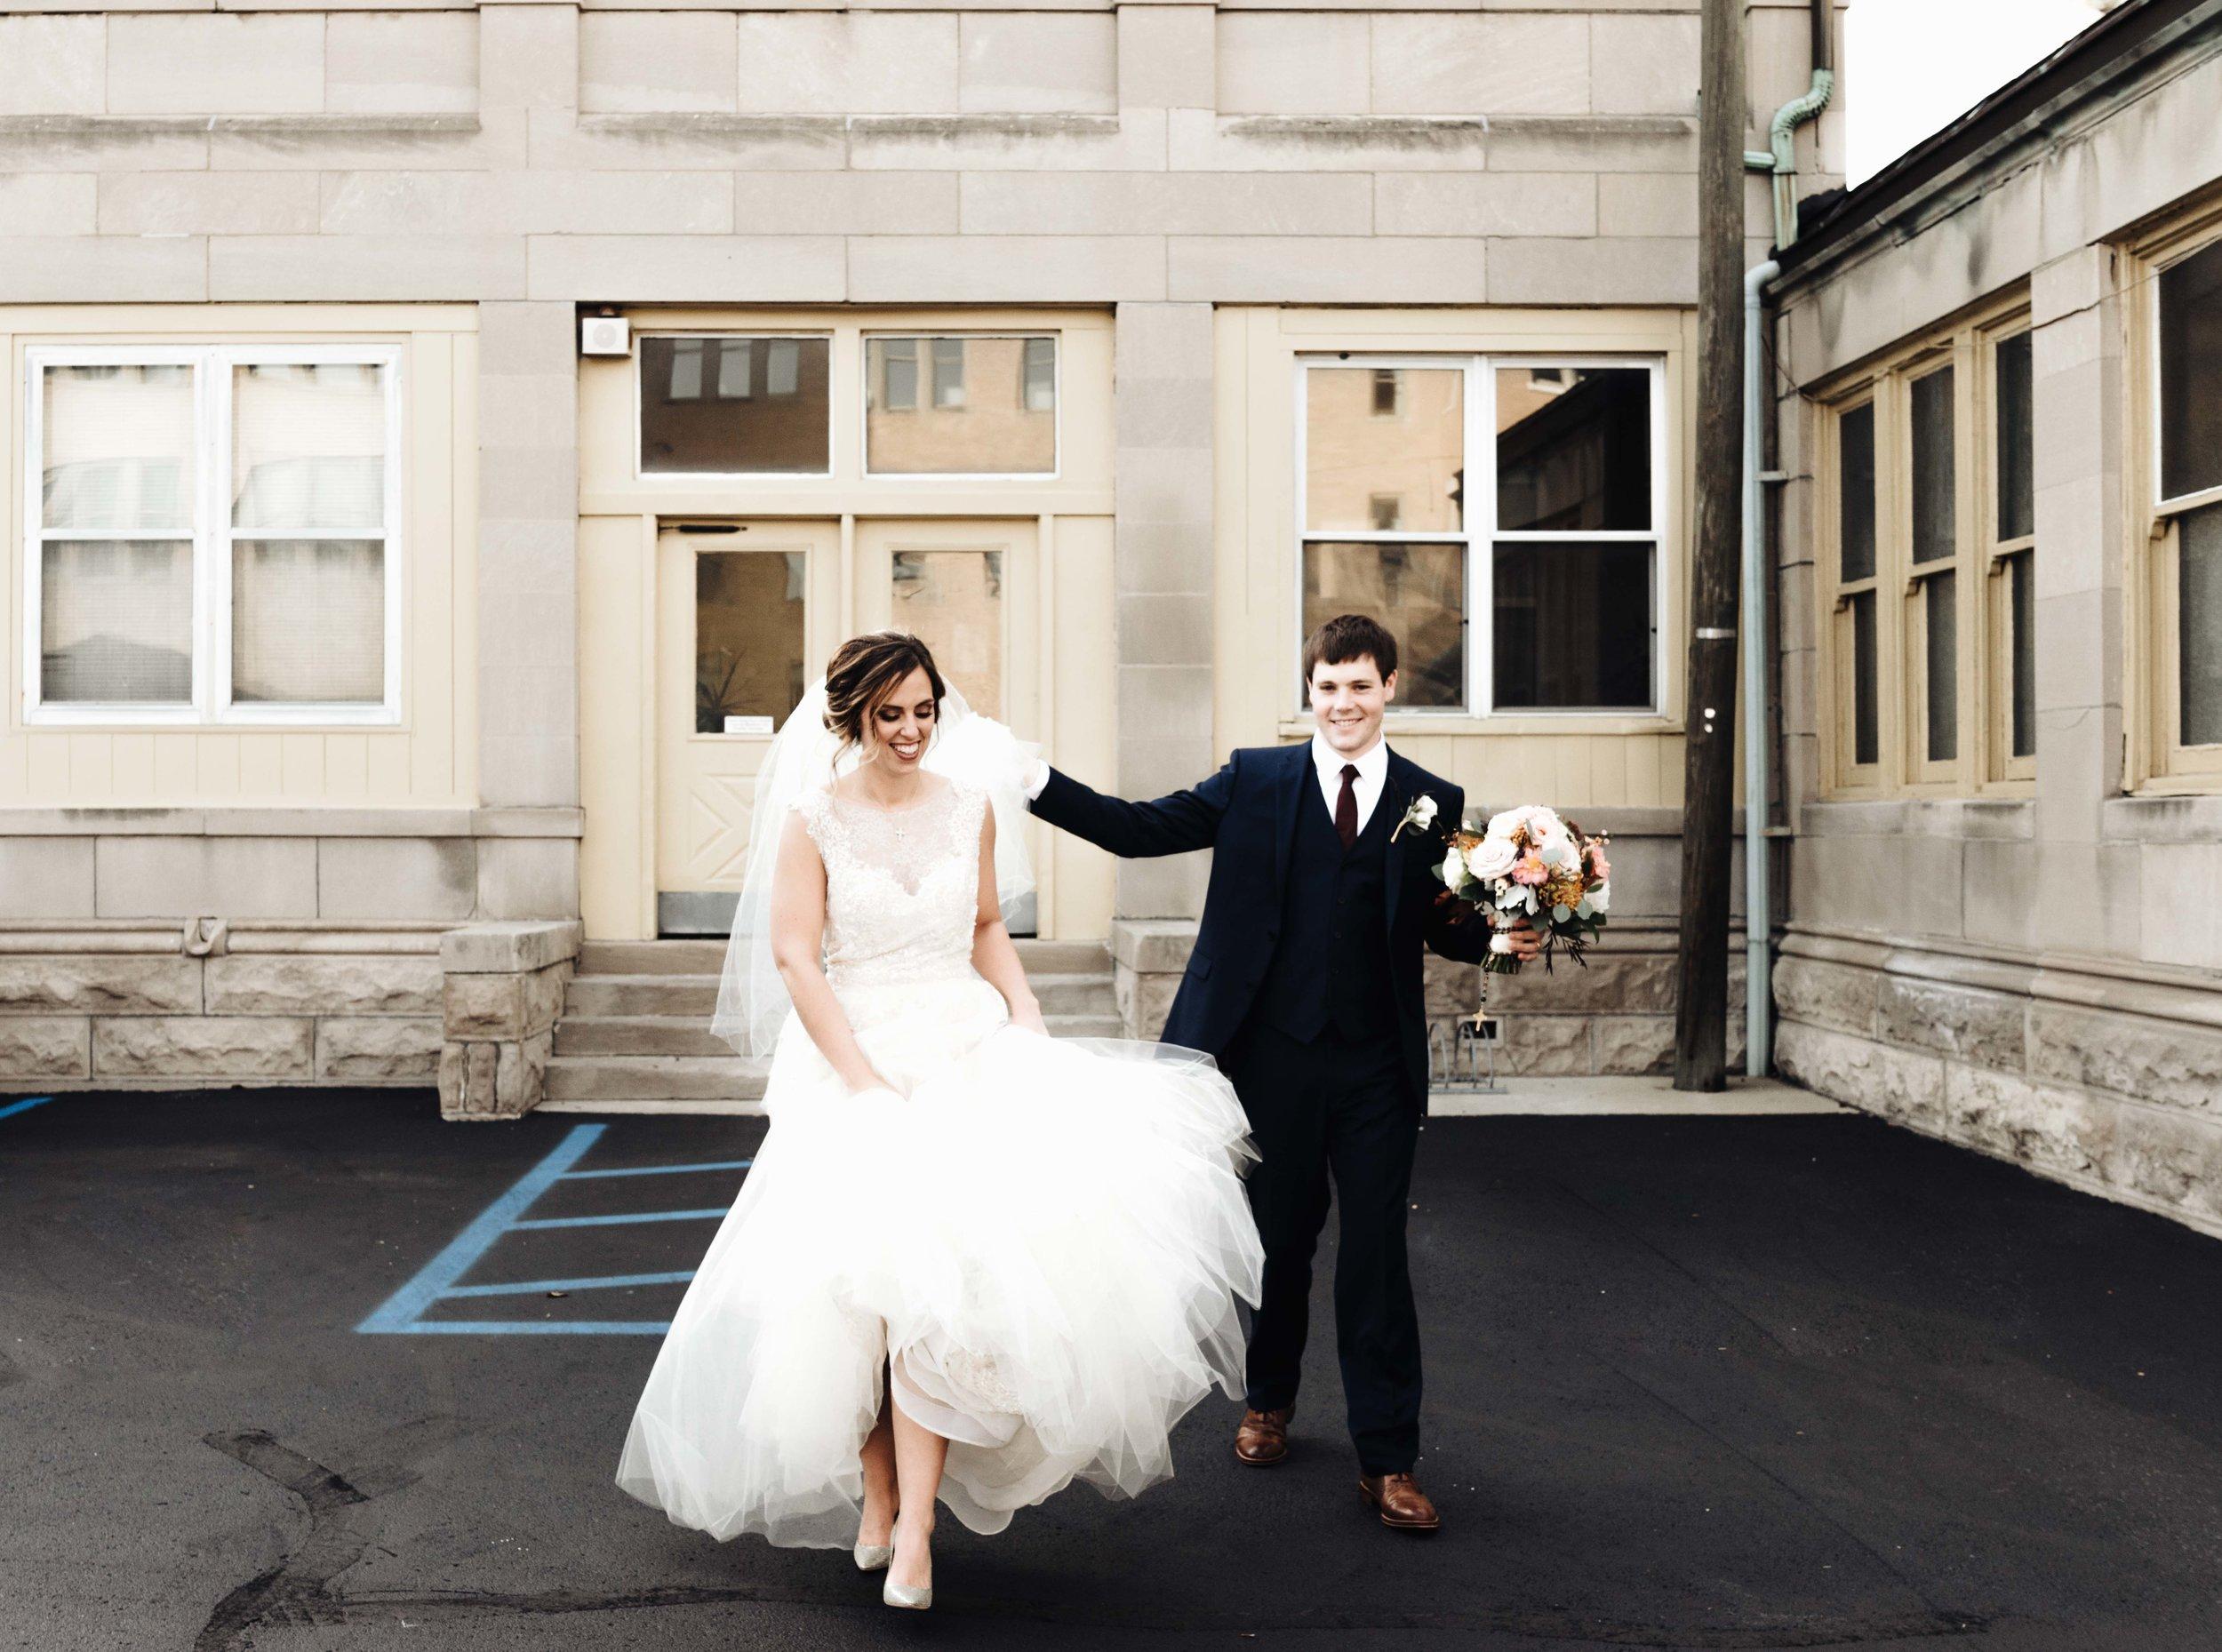 Carlee-Bob-Indianapolis-Wedding-Blog-67.jpg